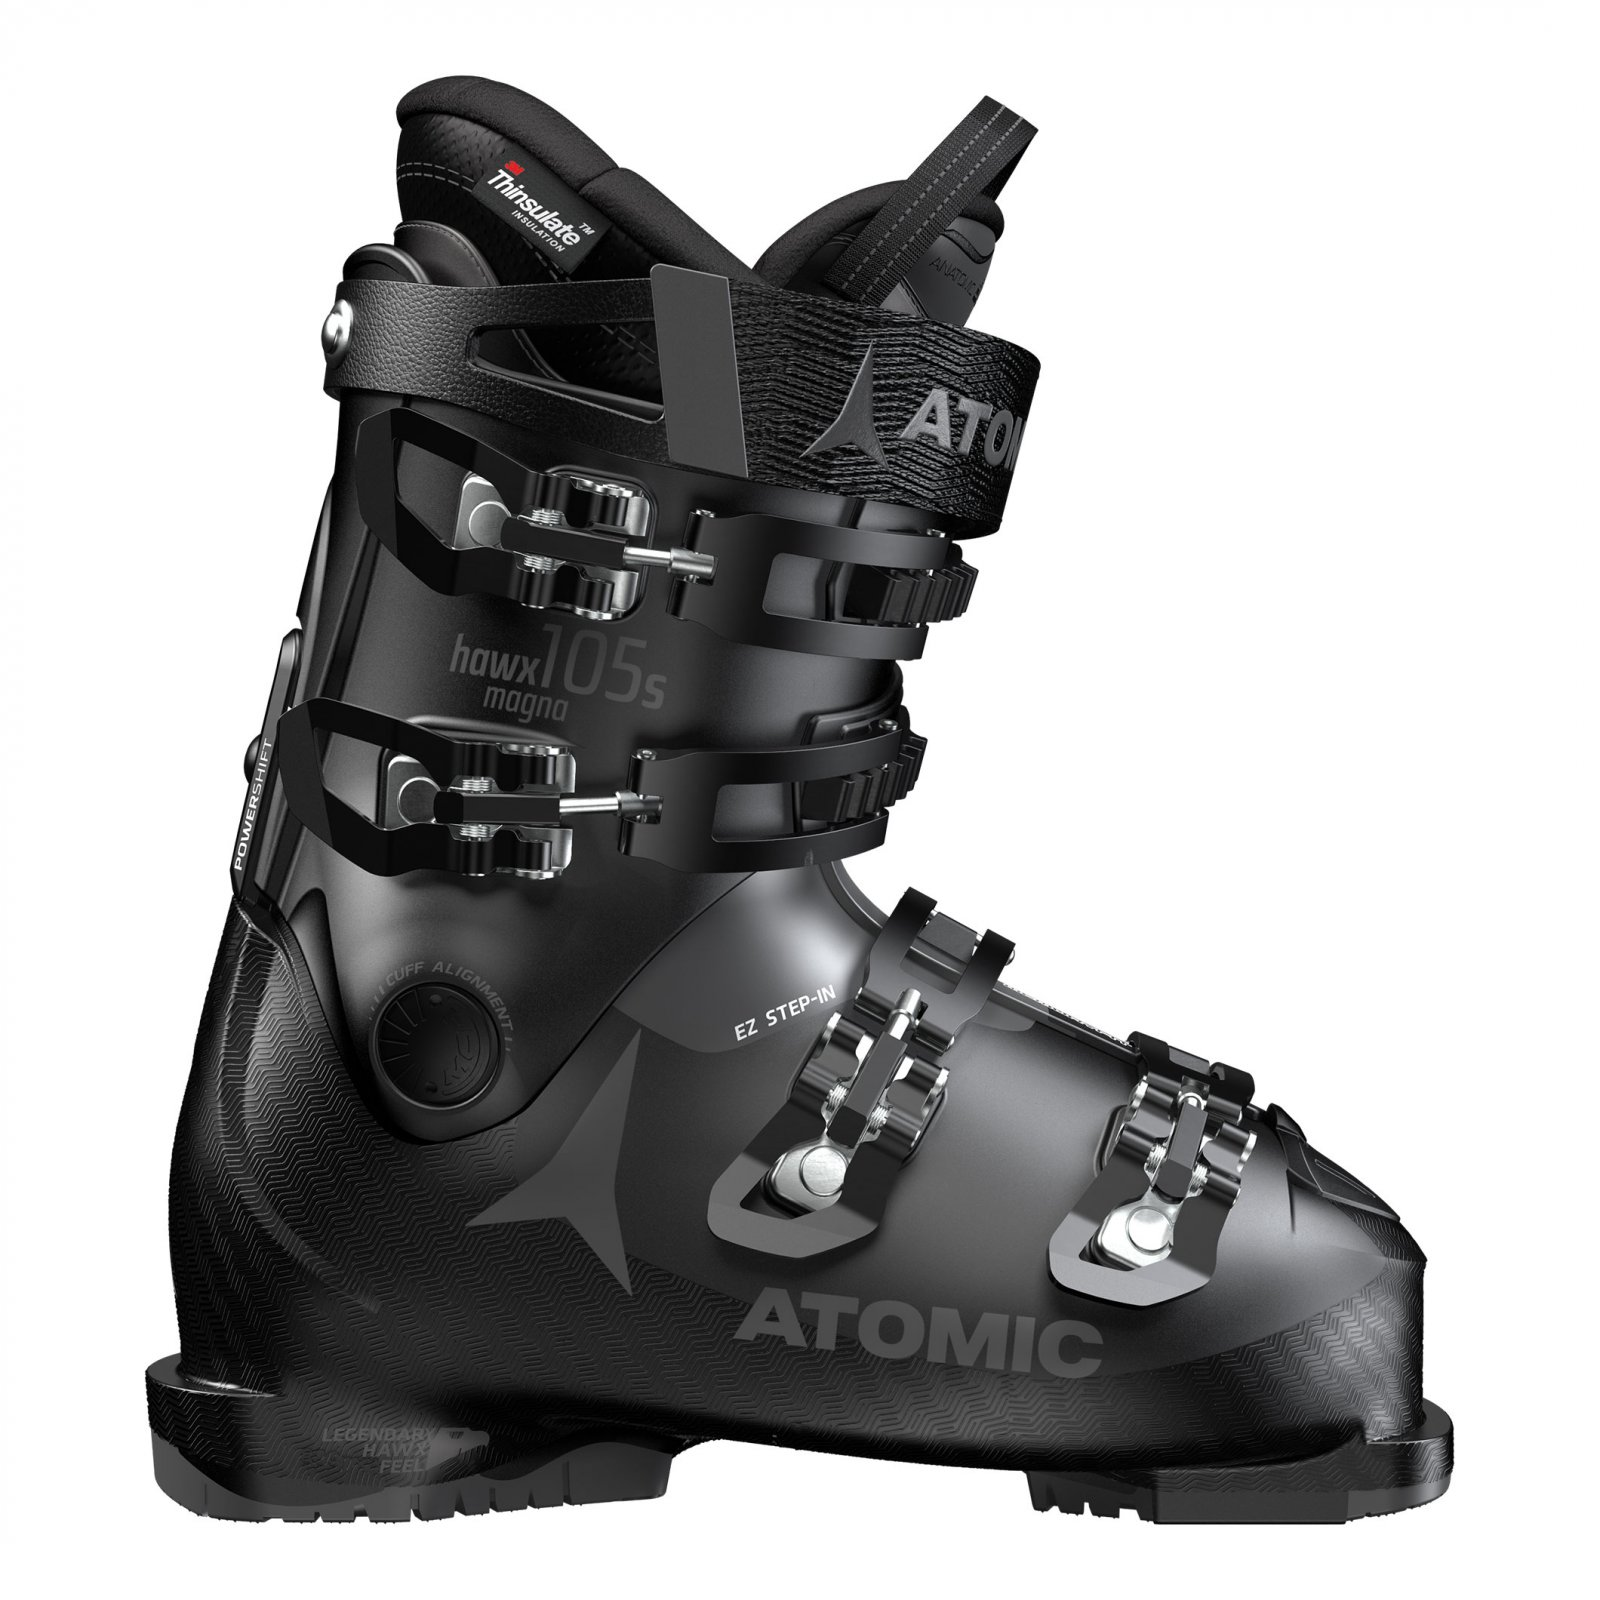 Atomic Hawx Magna 105 Women's Ski Boots